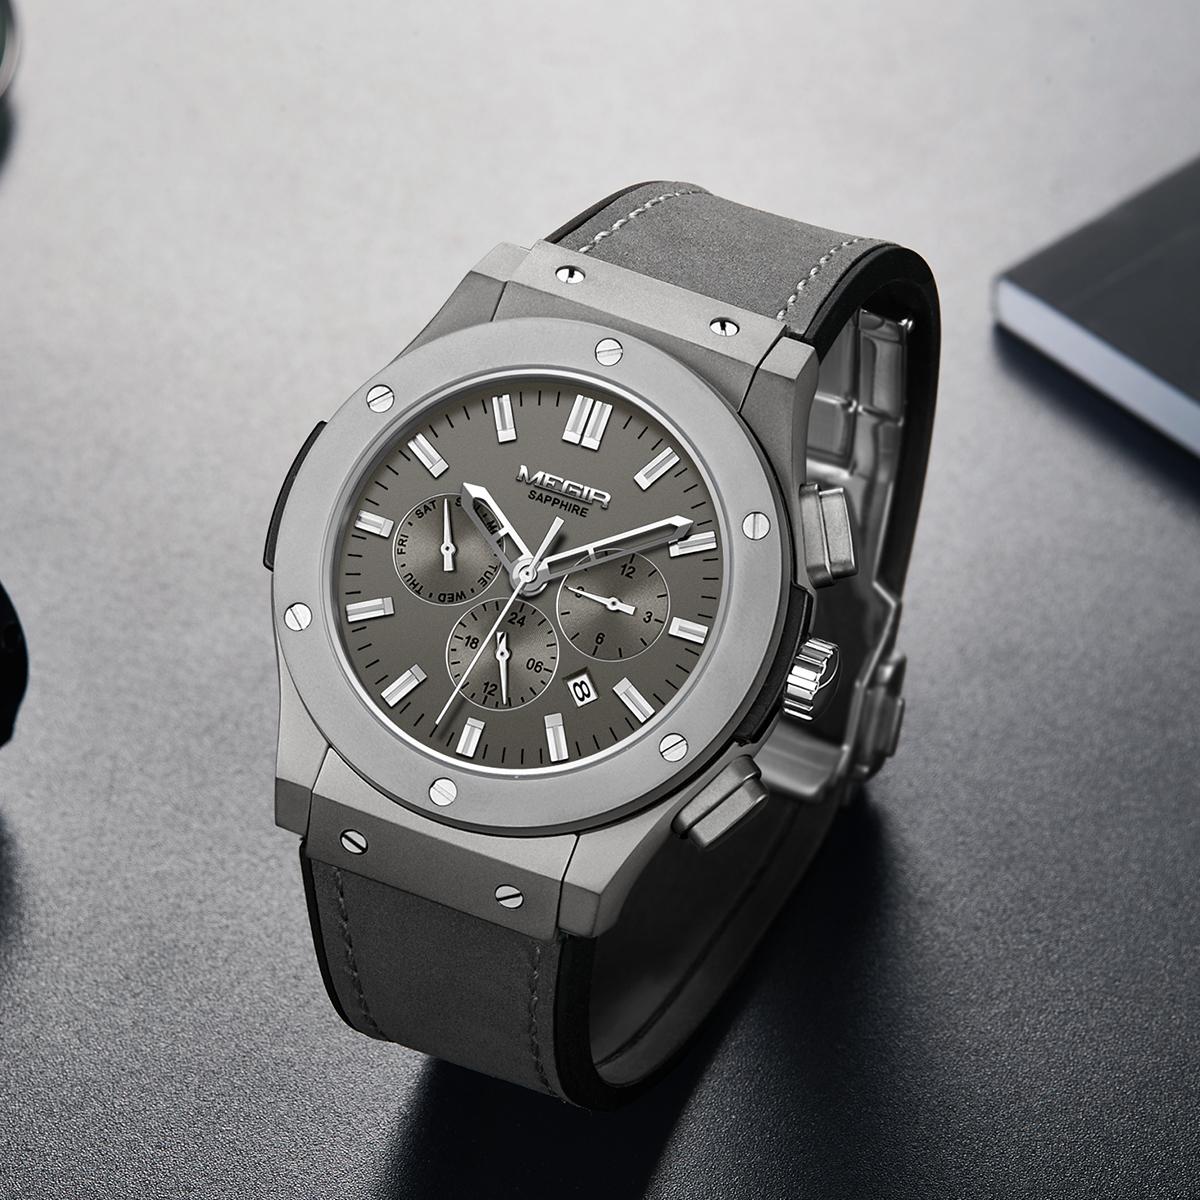 Leather strap watch sapphire multifunctional leisure sports wind fine steel waterproof automatic leather mens mechanical watch